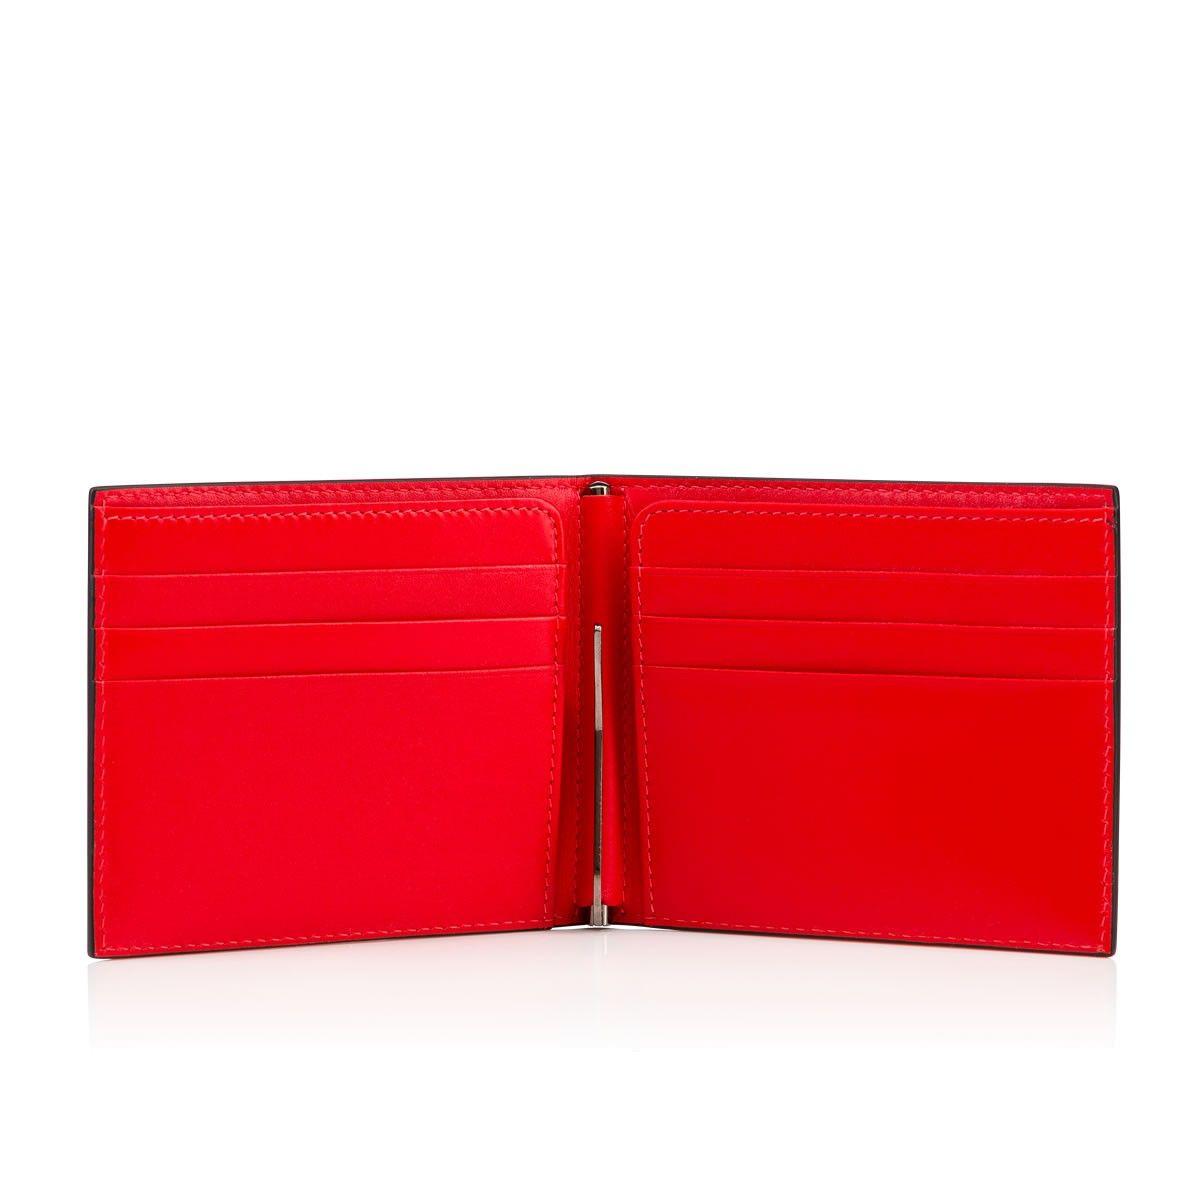 Accessoires Kaspero Money Clip Wallet Christian Louboutin